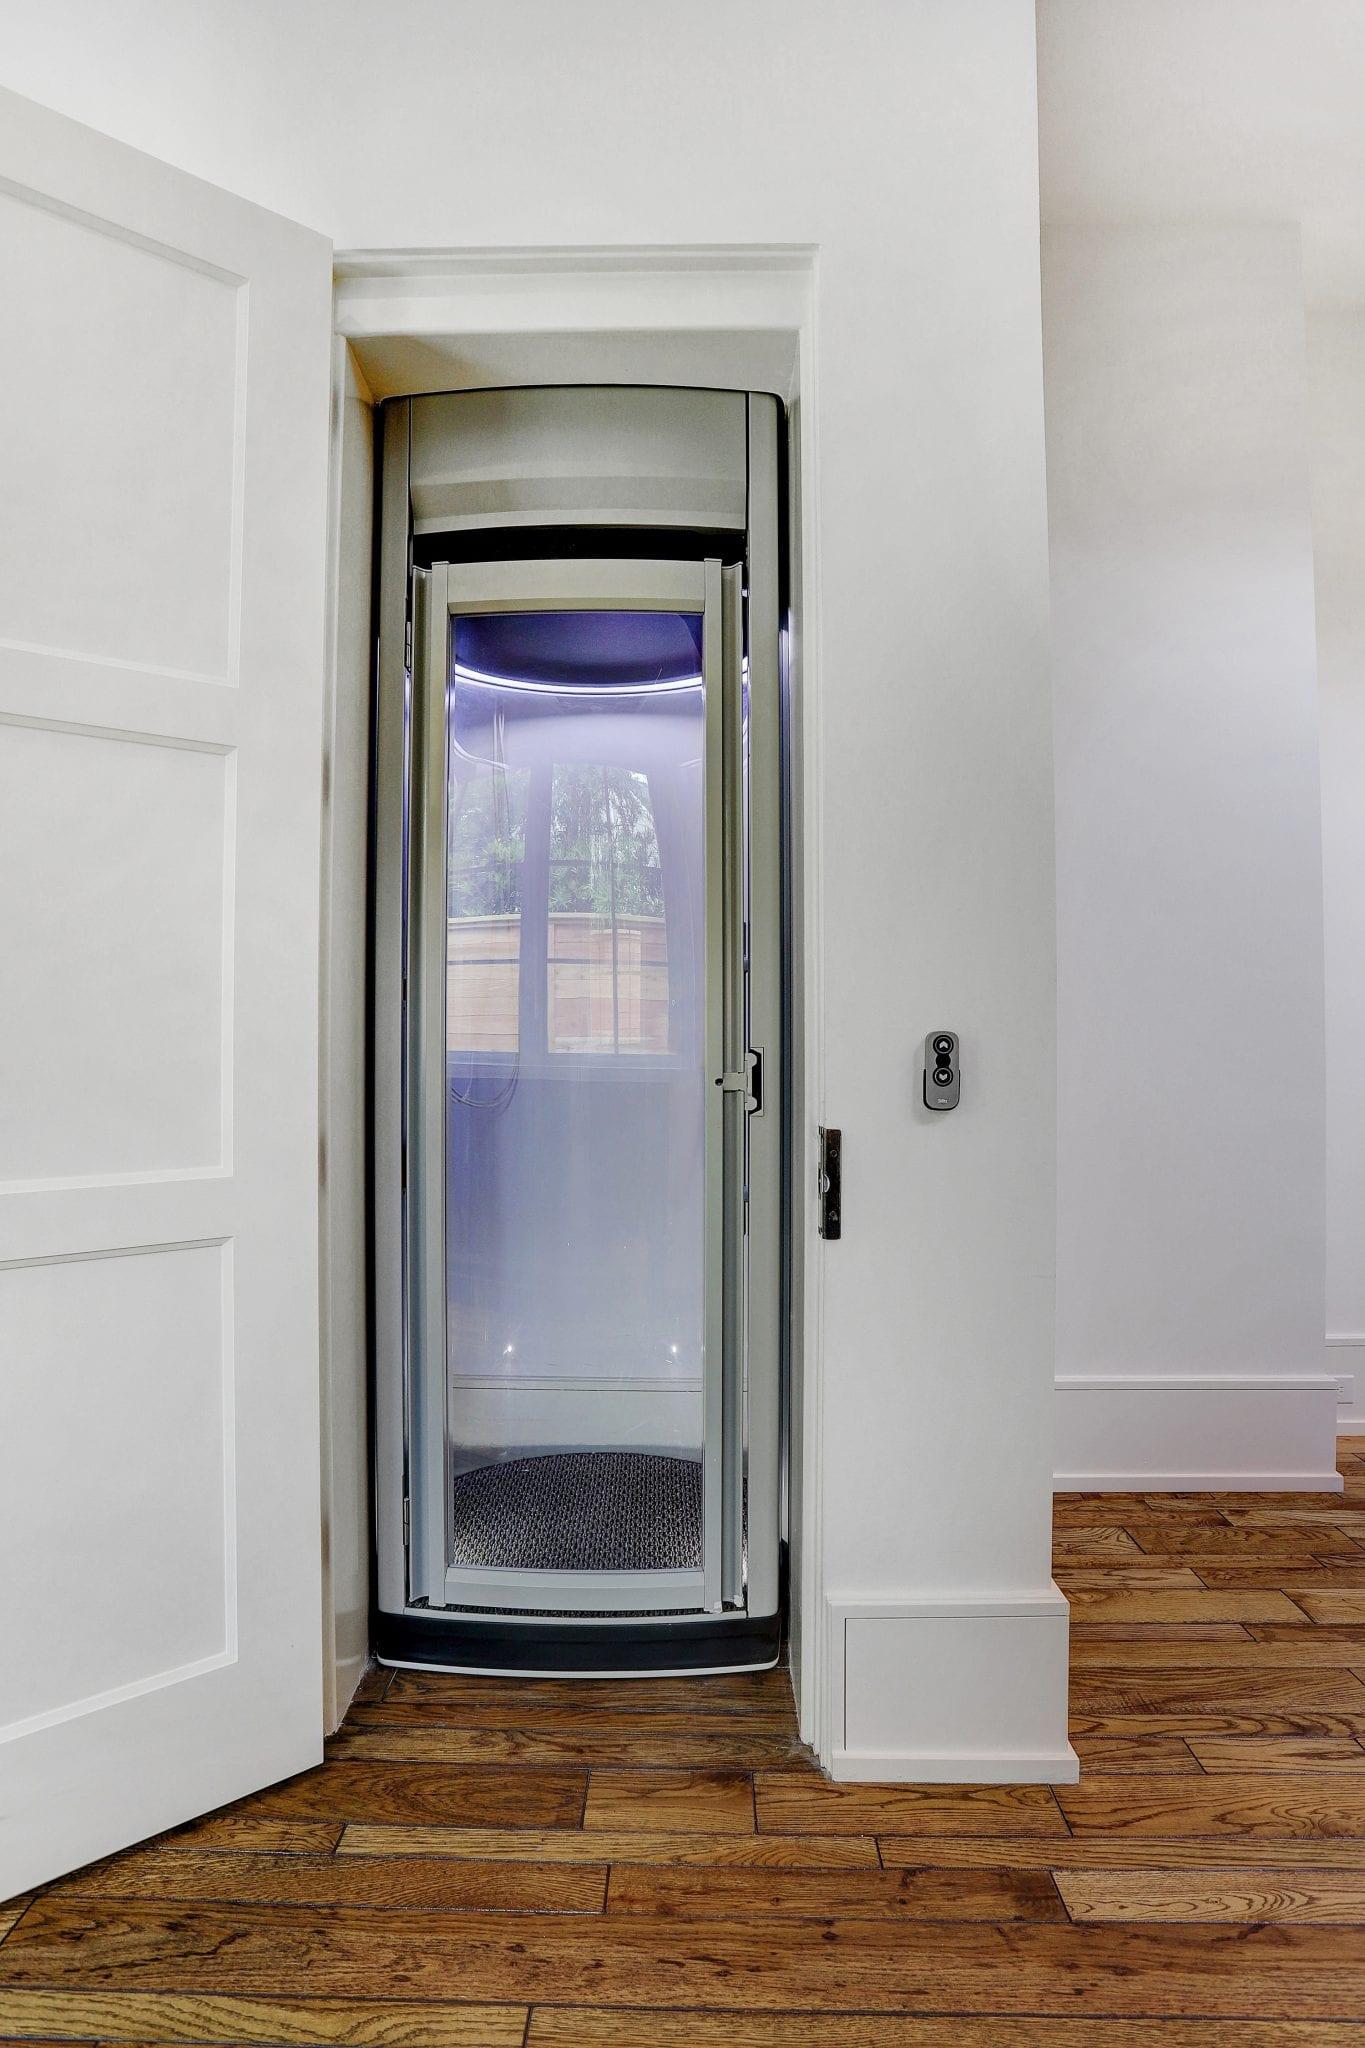 The Stiltz Residential Elevator